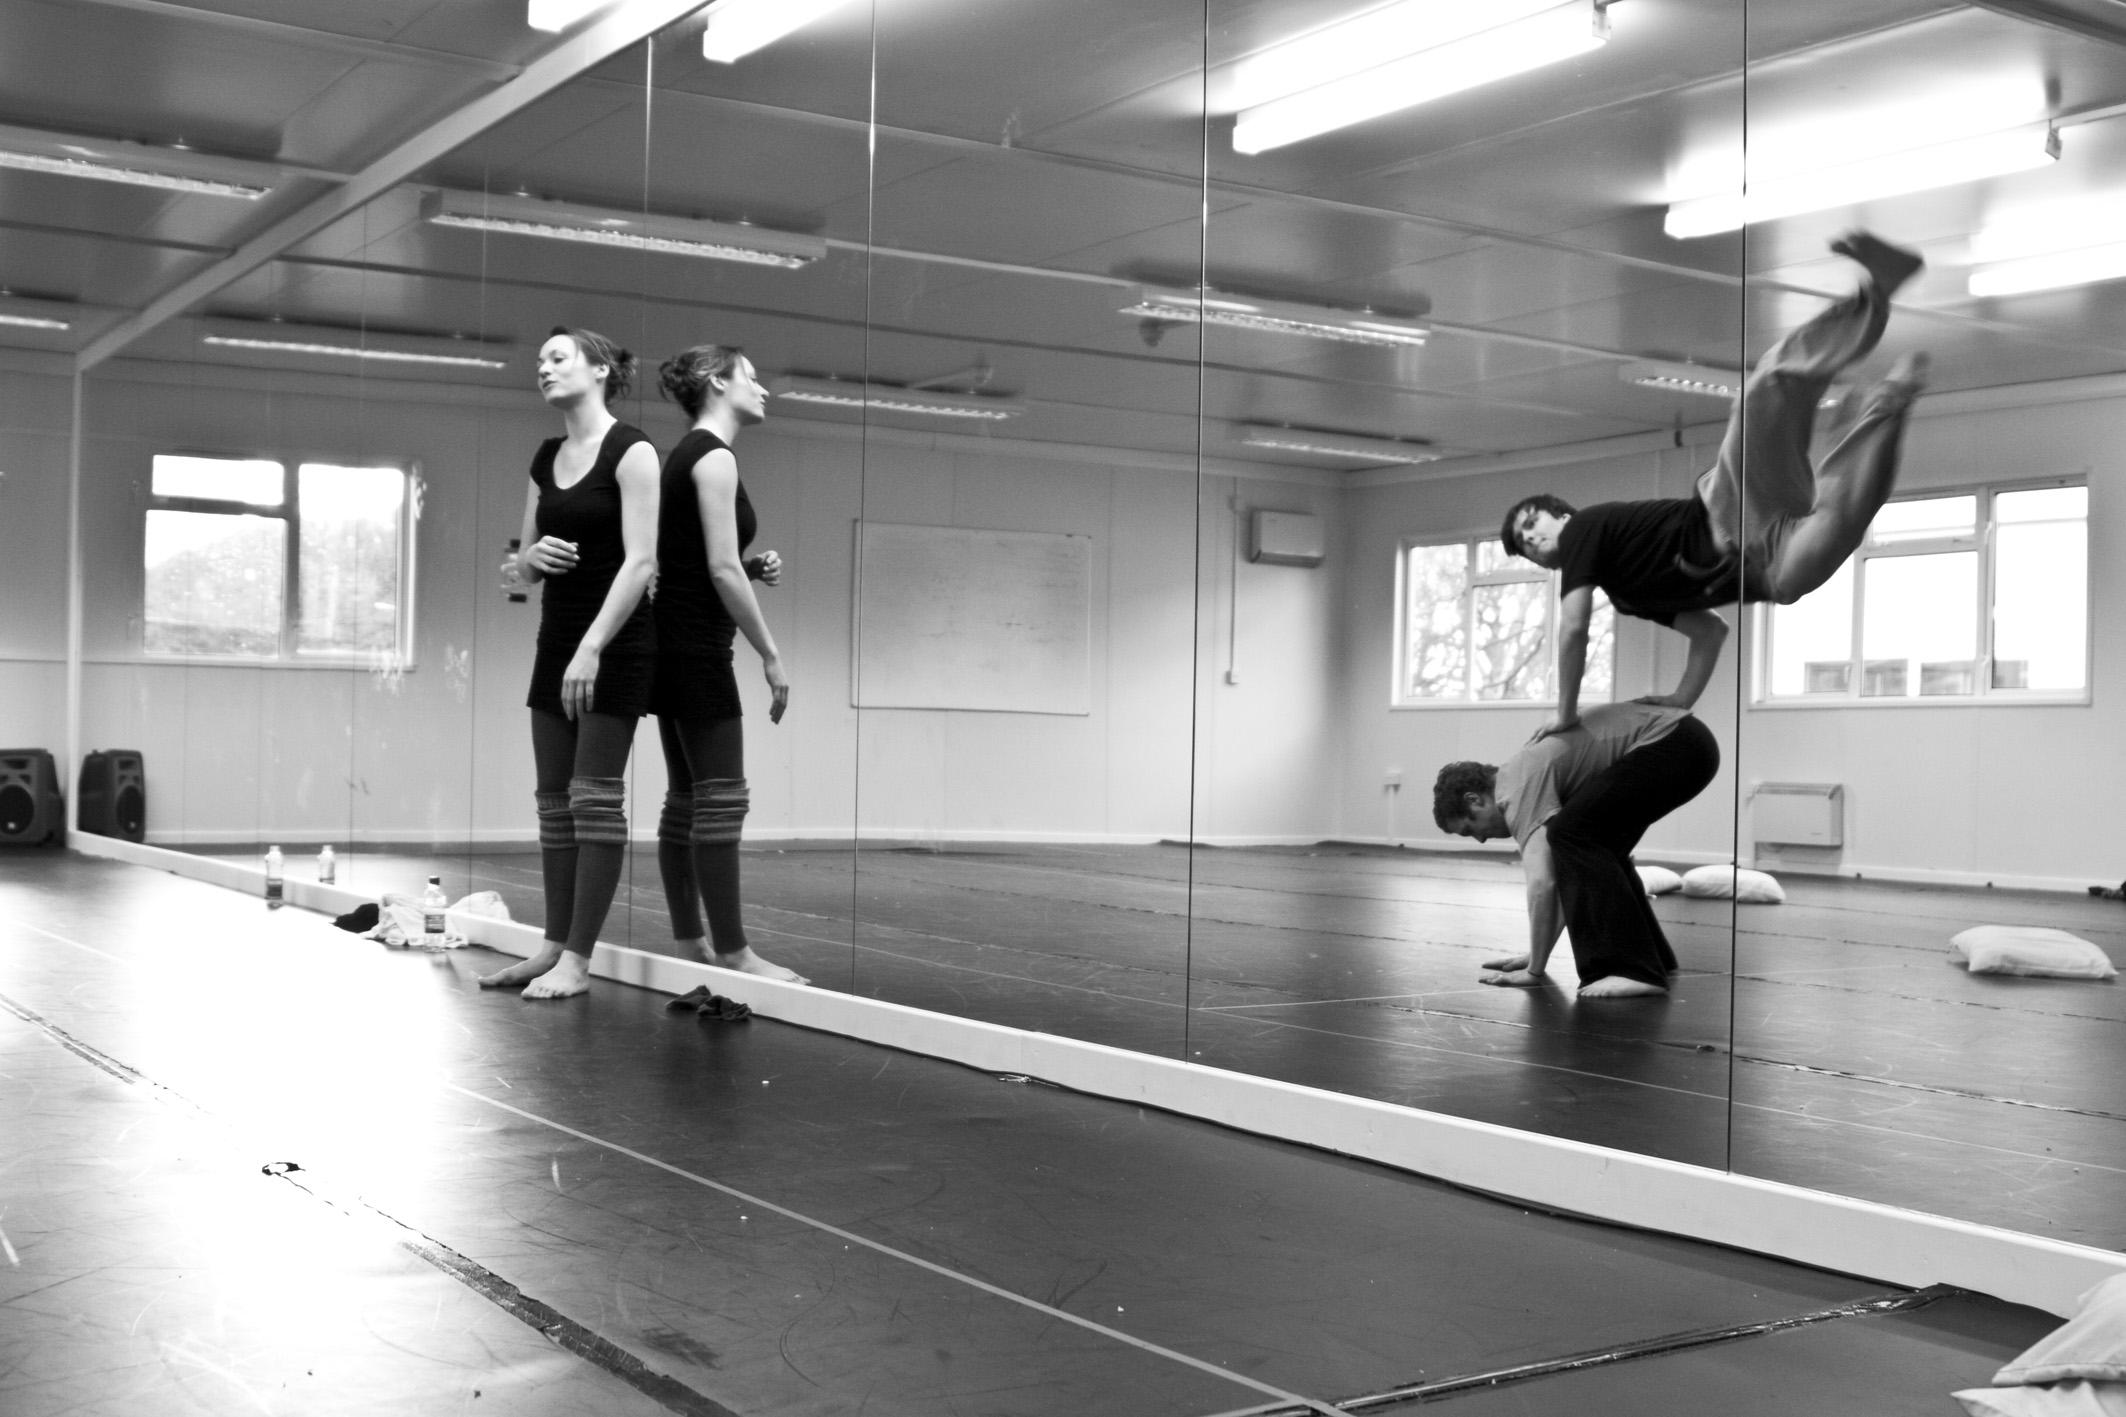 http://www.danceahead.co.uk/wp-content/uploads/2018/05/ATBOR2.jpg